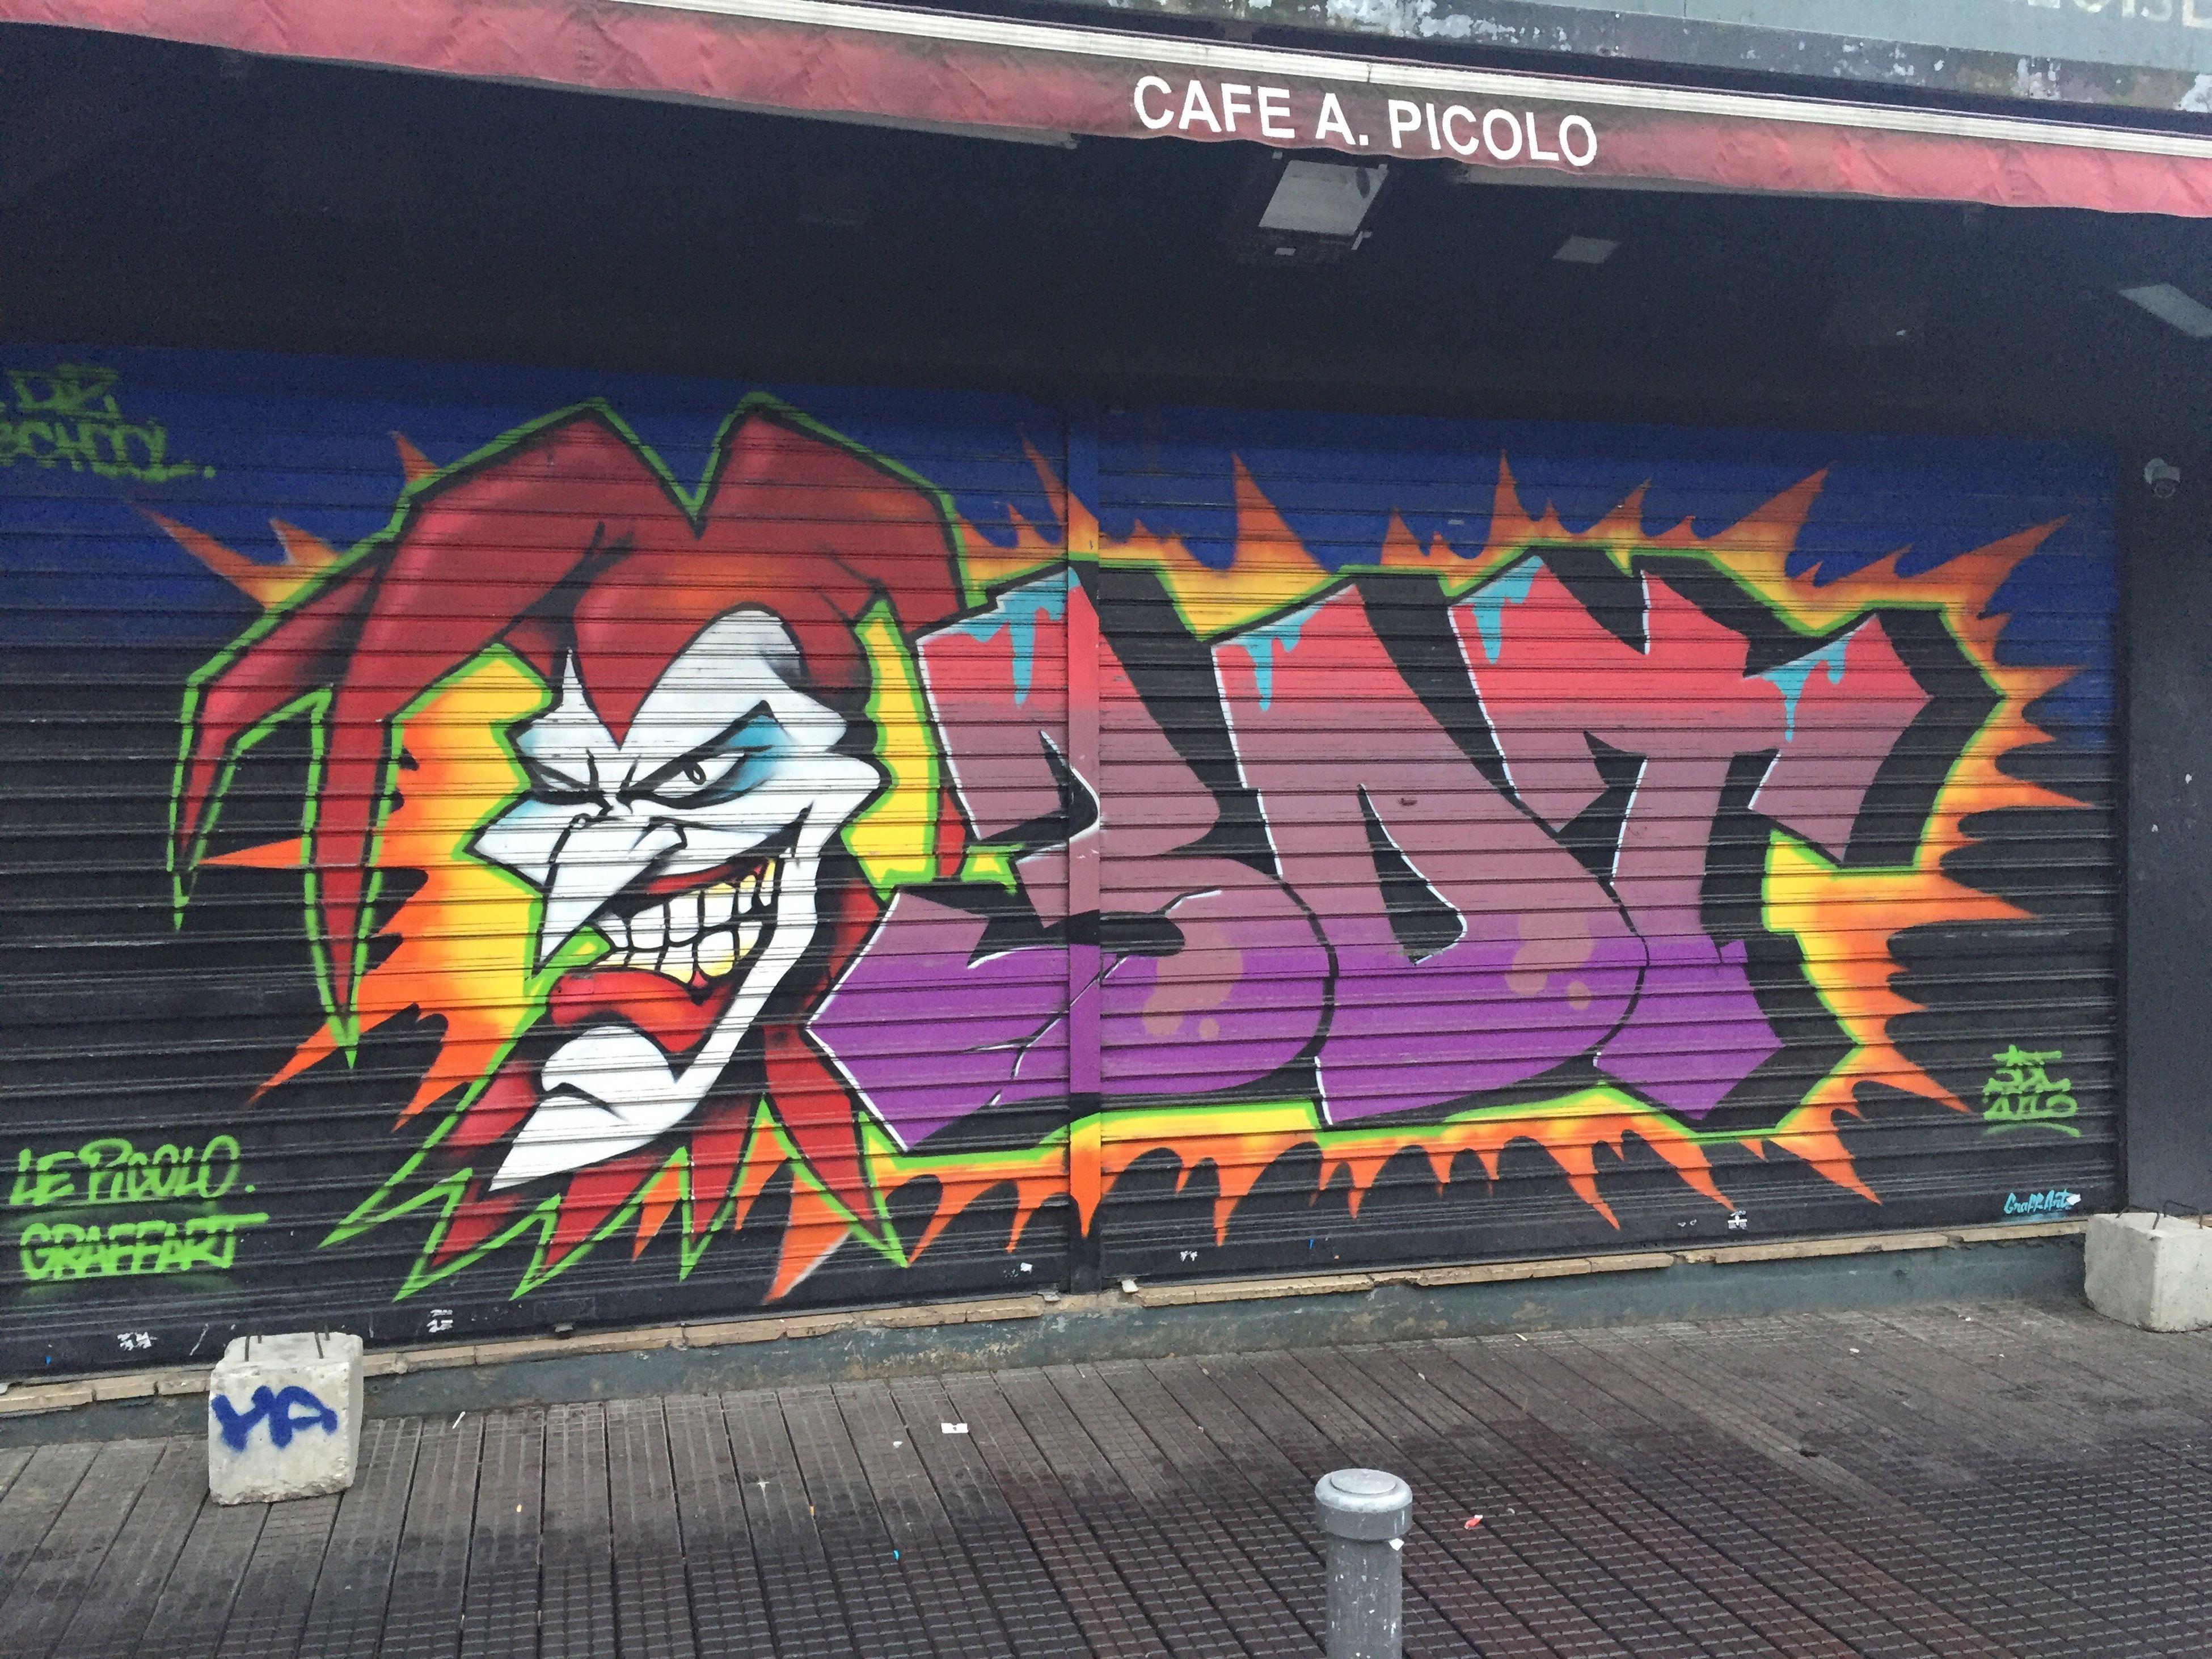 Back to paris Clignancourt marché aux puces Joker Joker Smile Graffiti Art And Craft Creativity Human Representation No People Text Built Structure Architecture Outdoors Day Building Exterior Clignancourt Marché Aux Puces